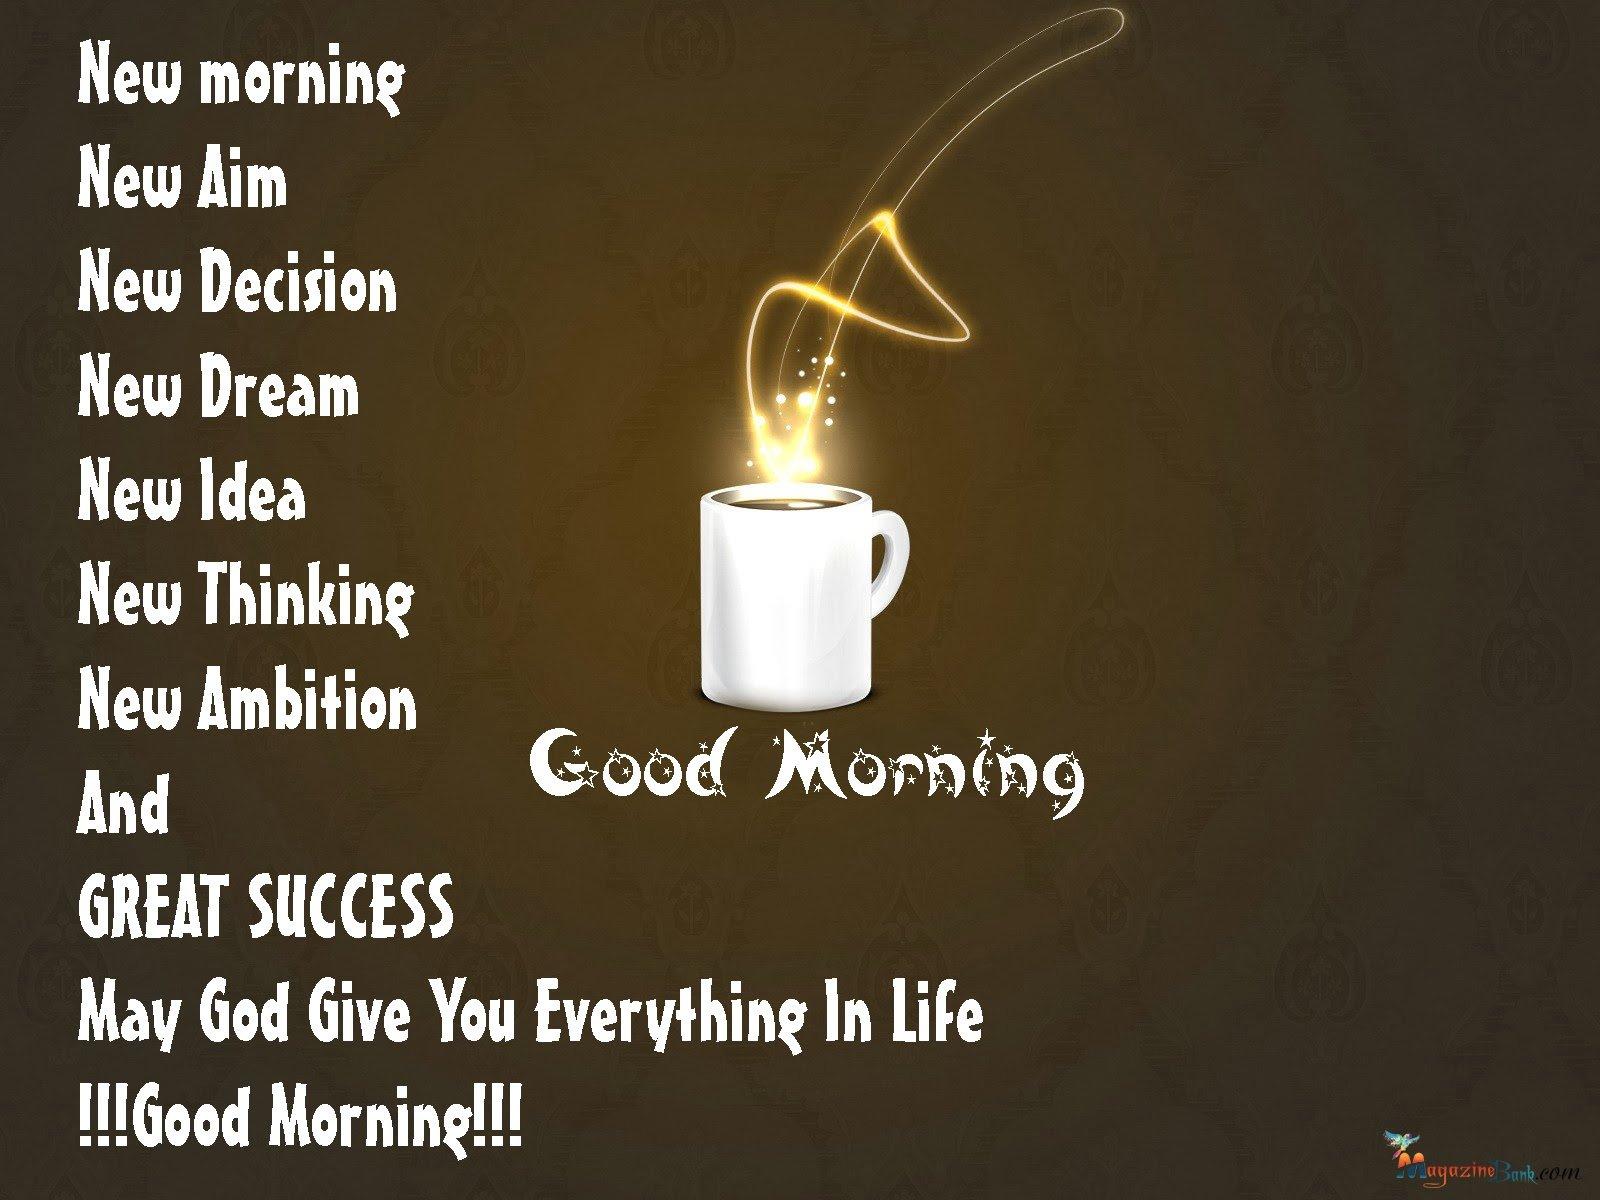 Good Morning Greetings Motivational Mood Wallpaper 1600x1200